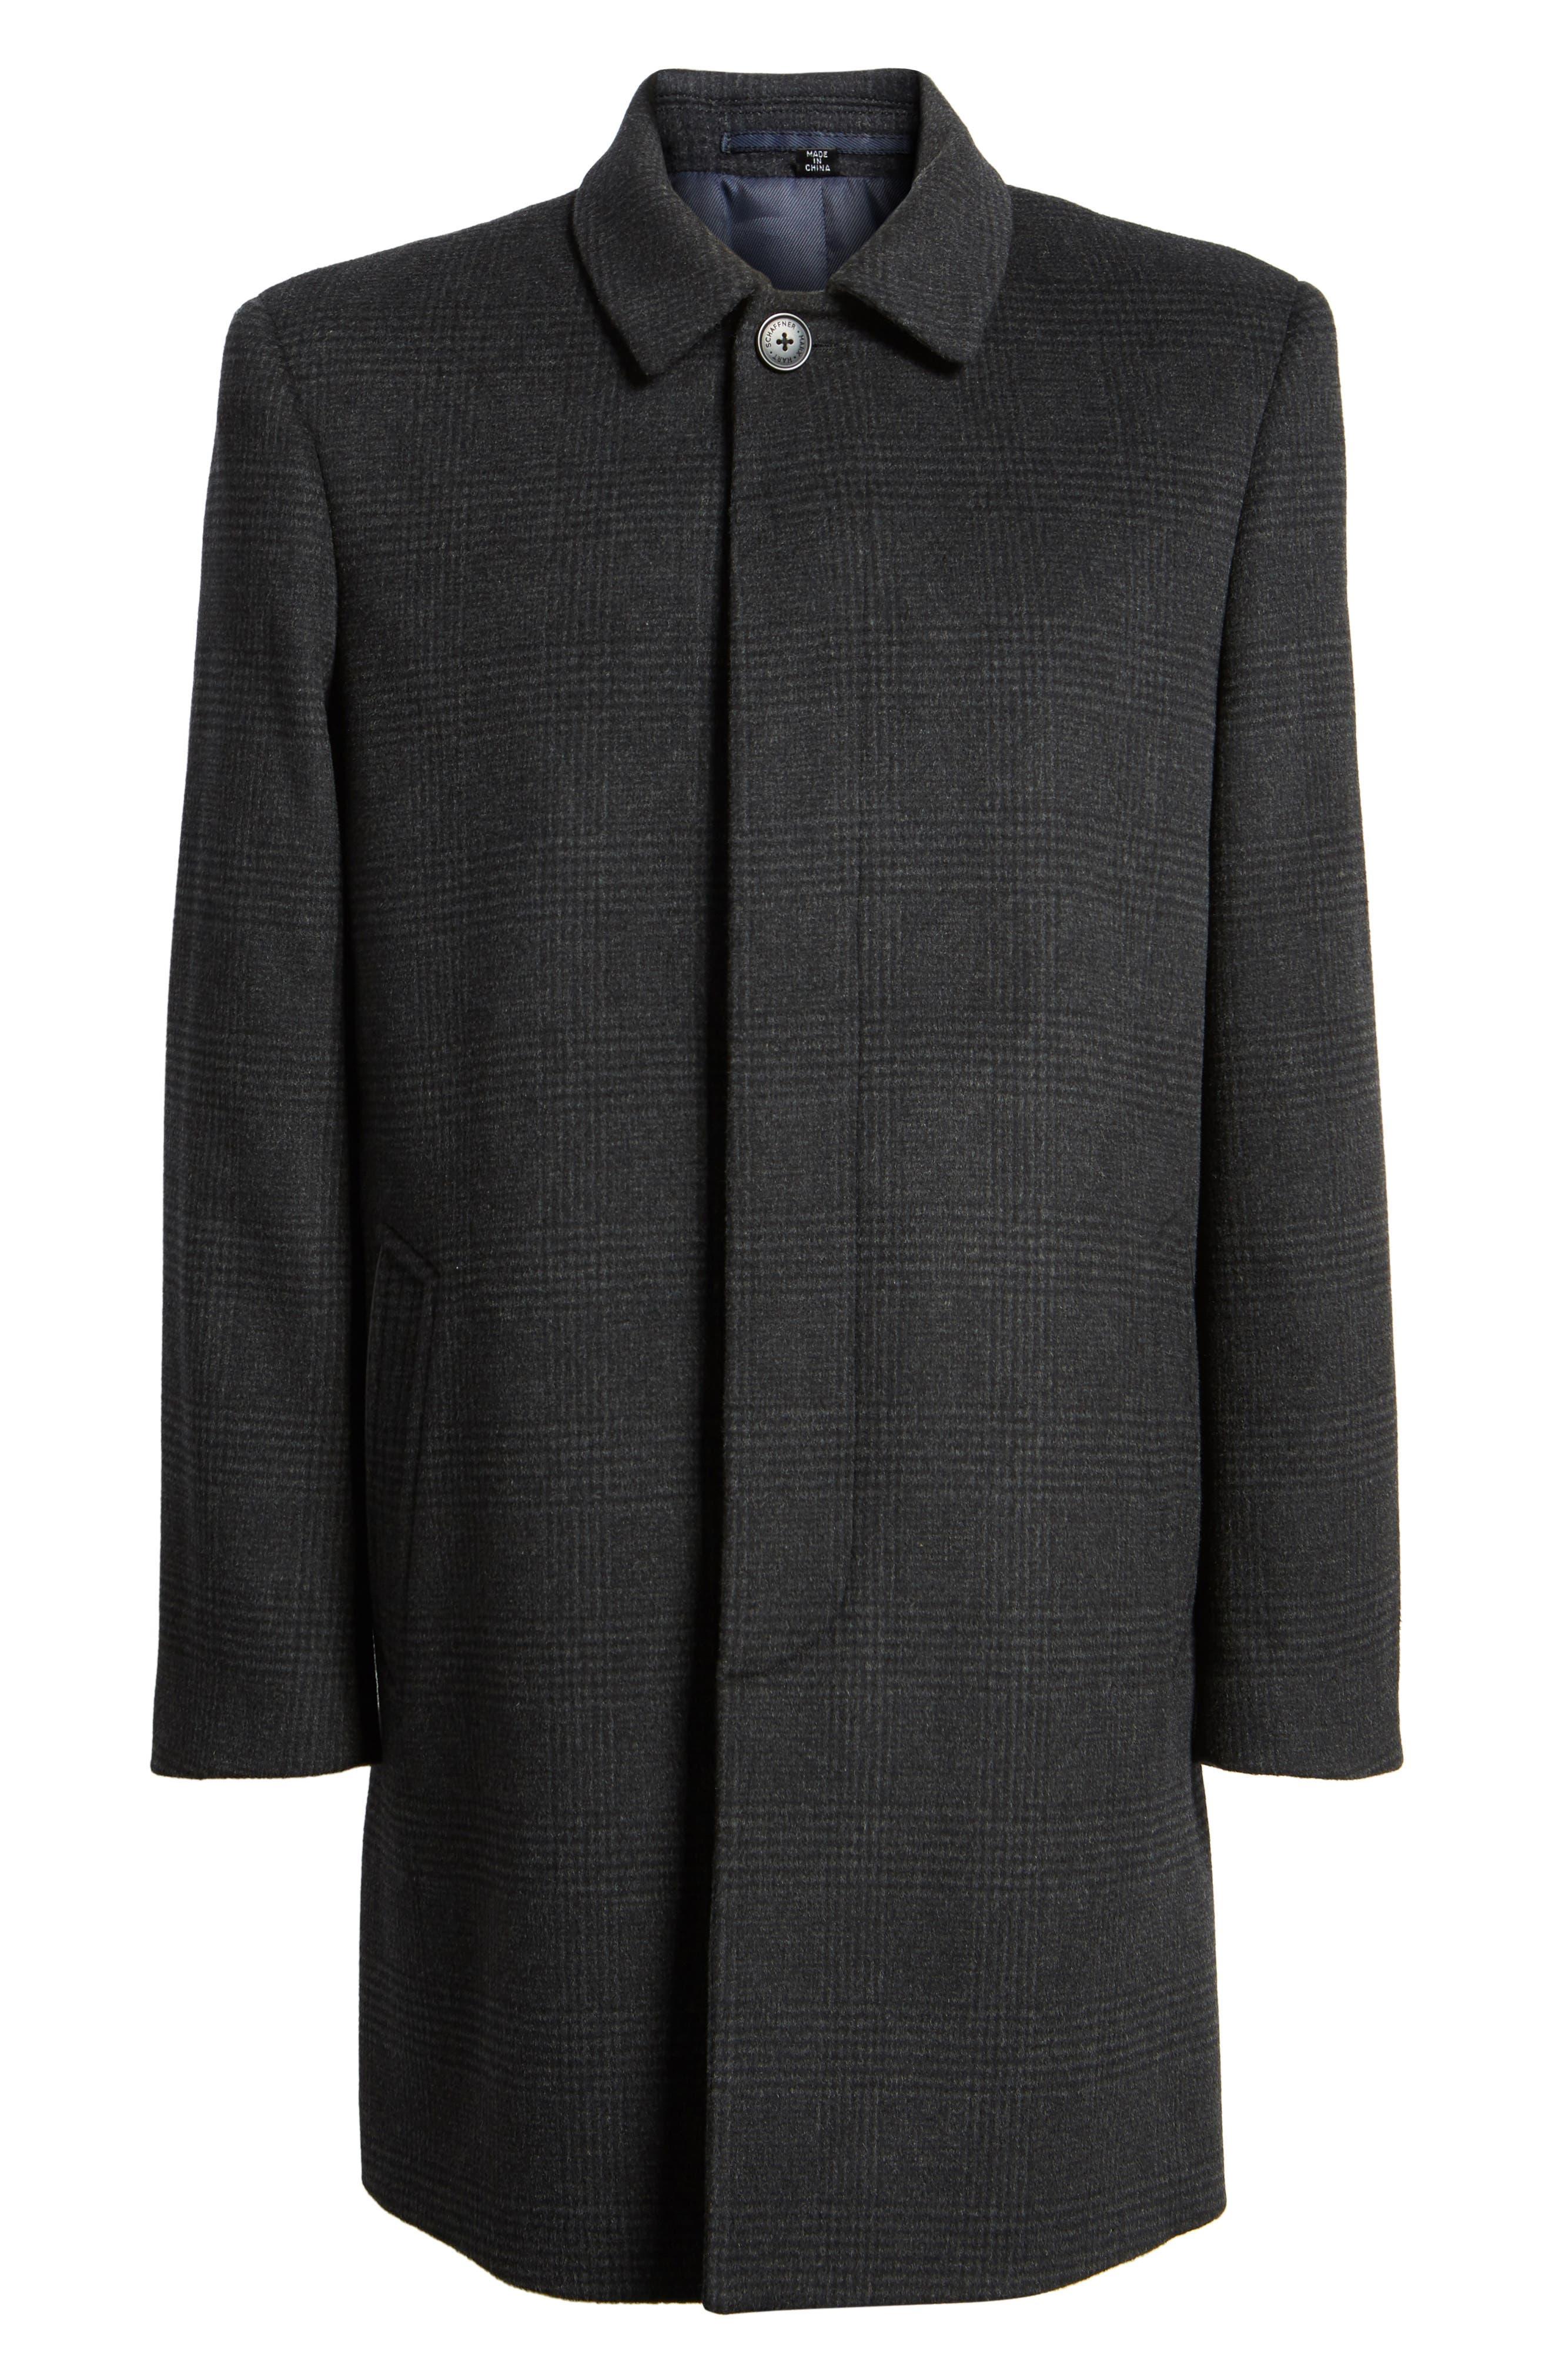 Turner Plaid Wool Blend Topcoat,                             Alternate thumbnail 6, color,                             Dark Charcoal